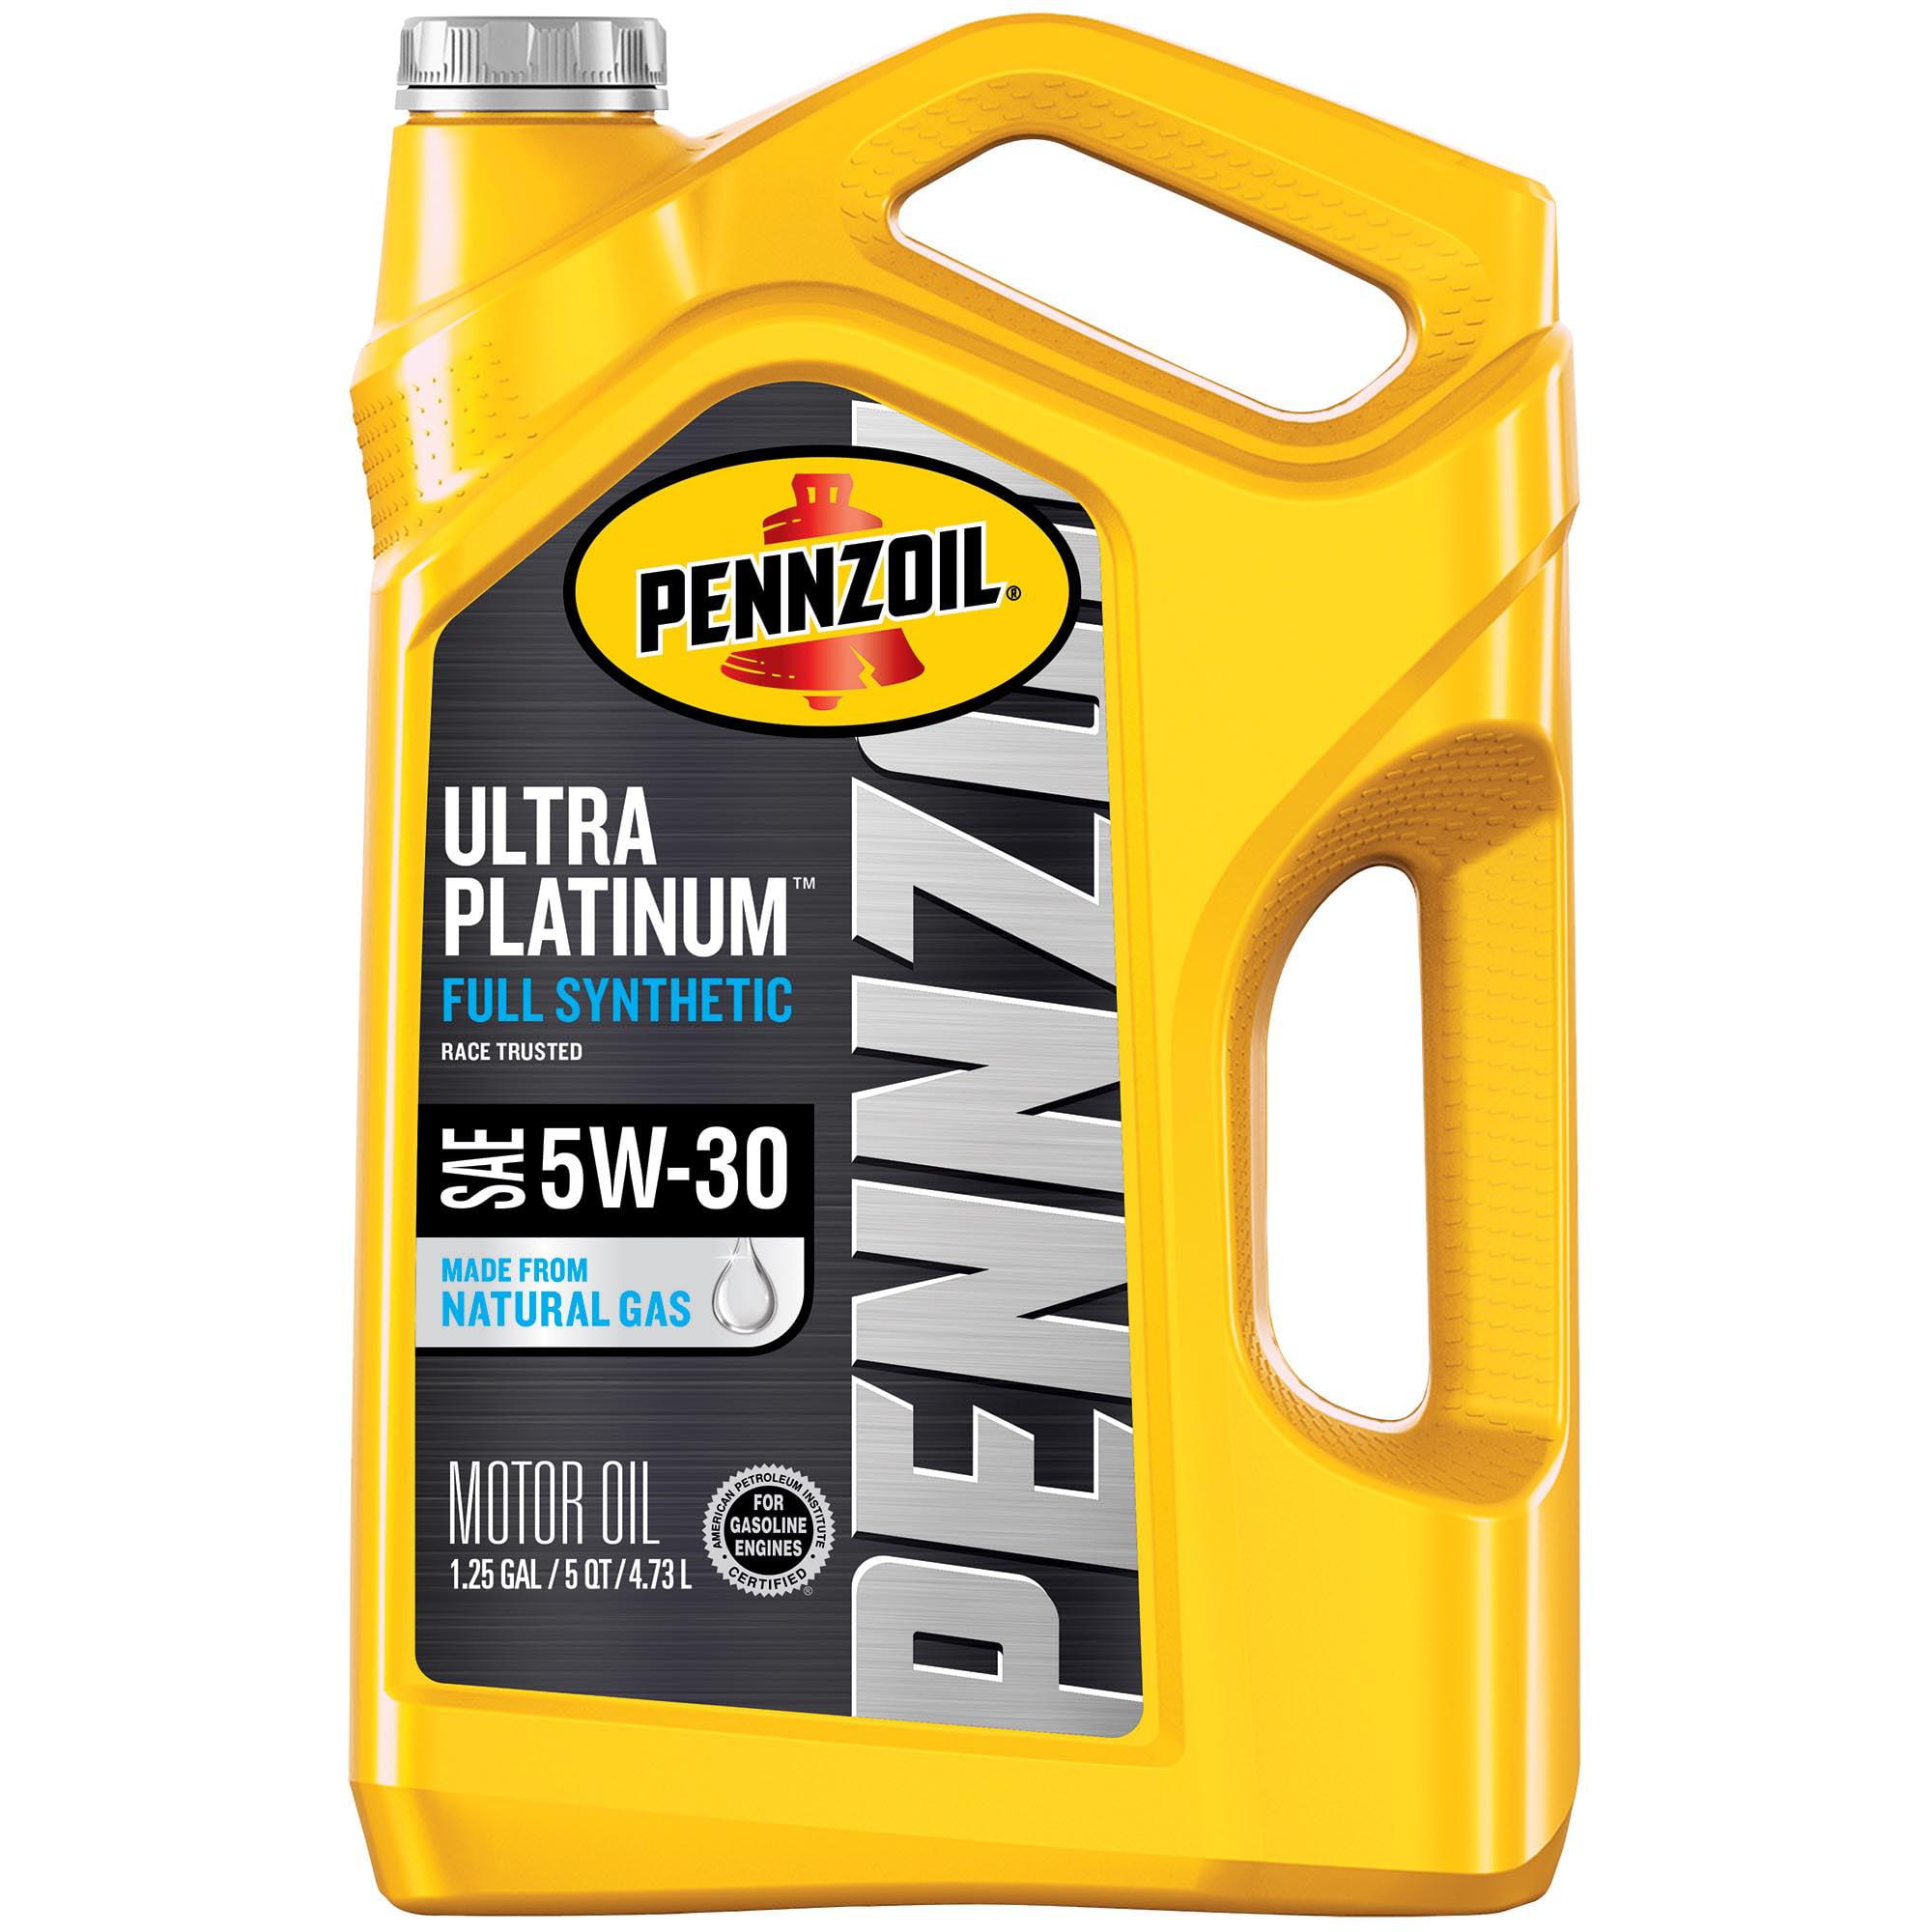 Pennzoil Near Me >> Pennzoil Ultra Platinum 5w 30 Full Synthetic Motor Oil 5 Quart Walmart Com